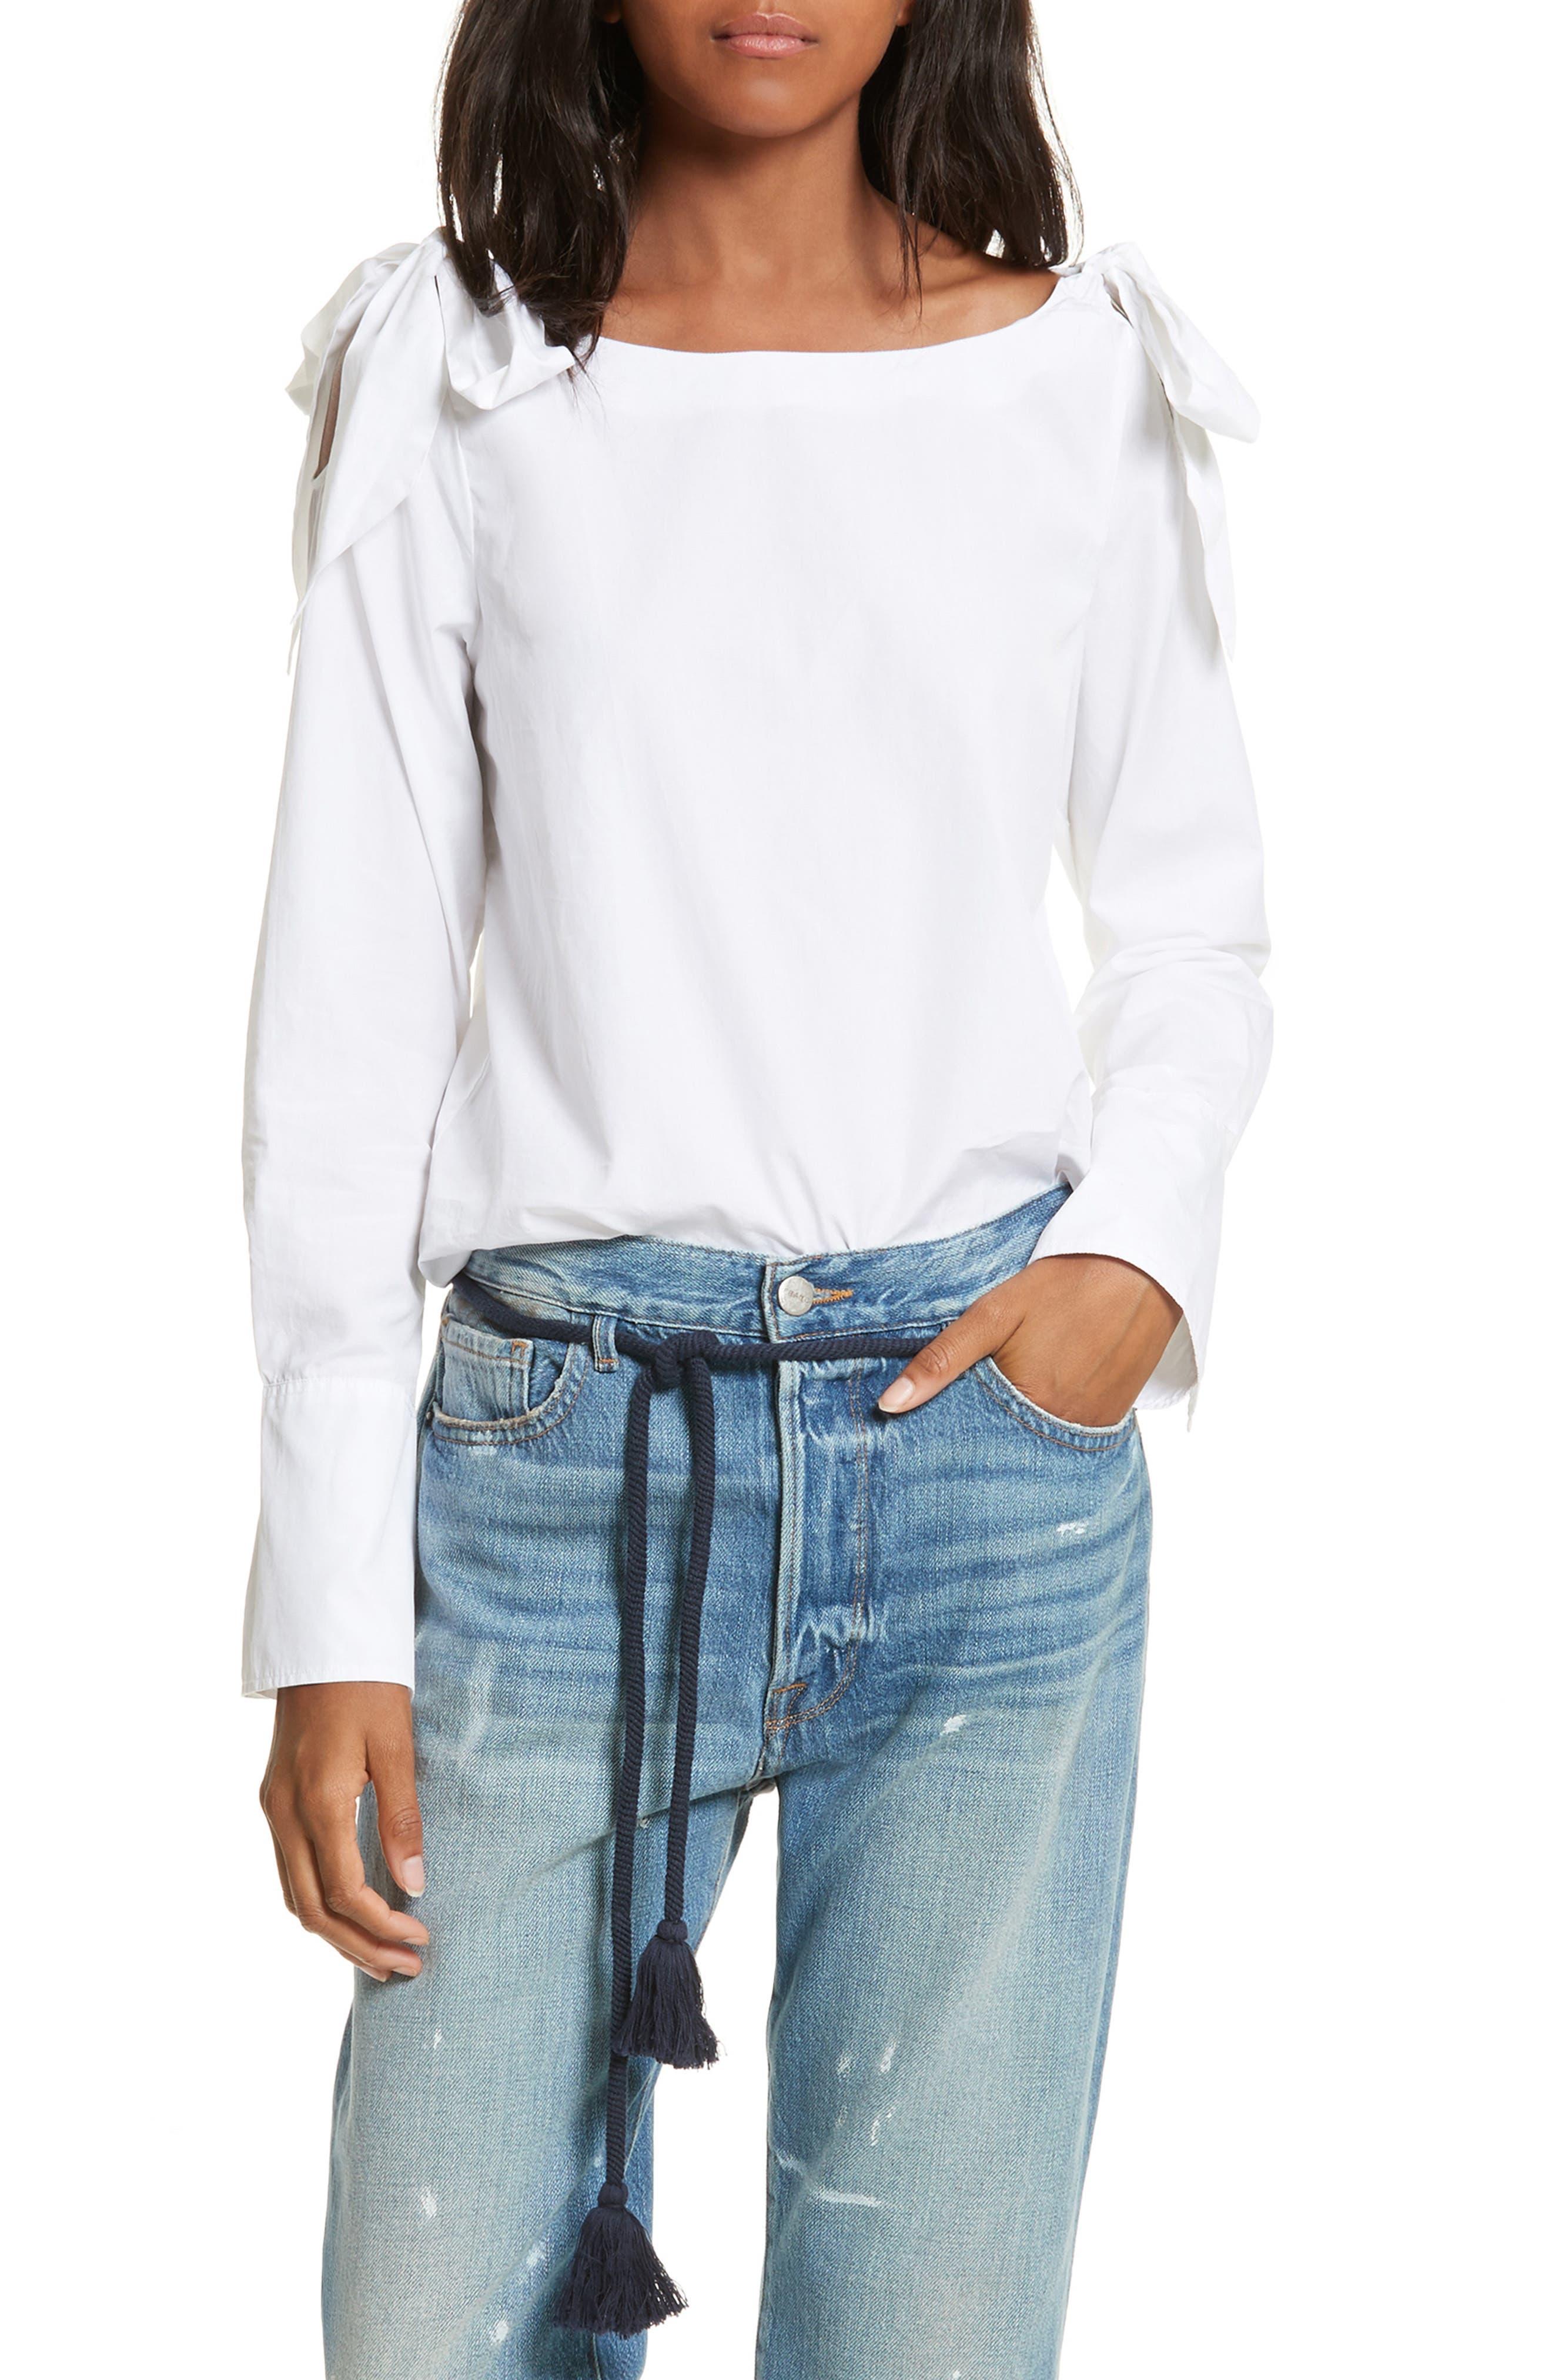 Main Image - FRAME Bow Cold Shoulder Cotton Blouse